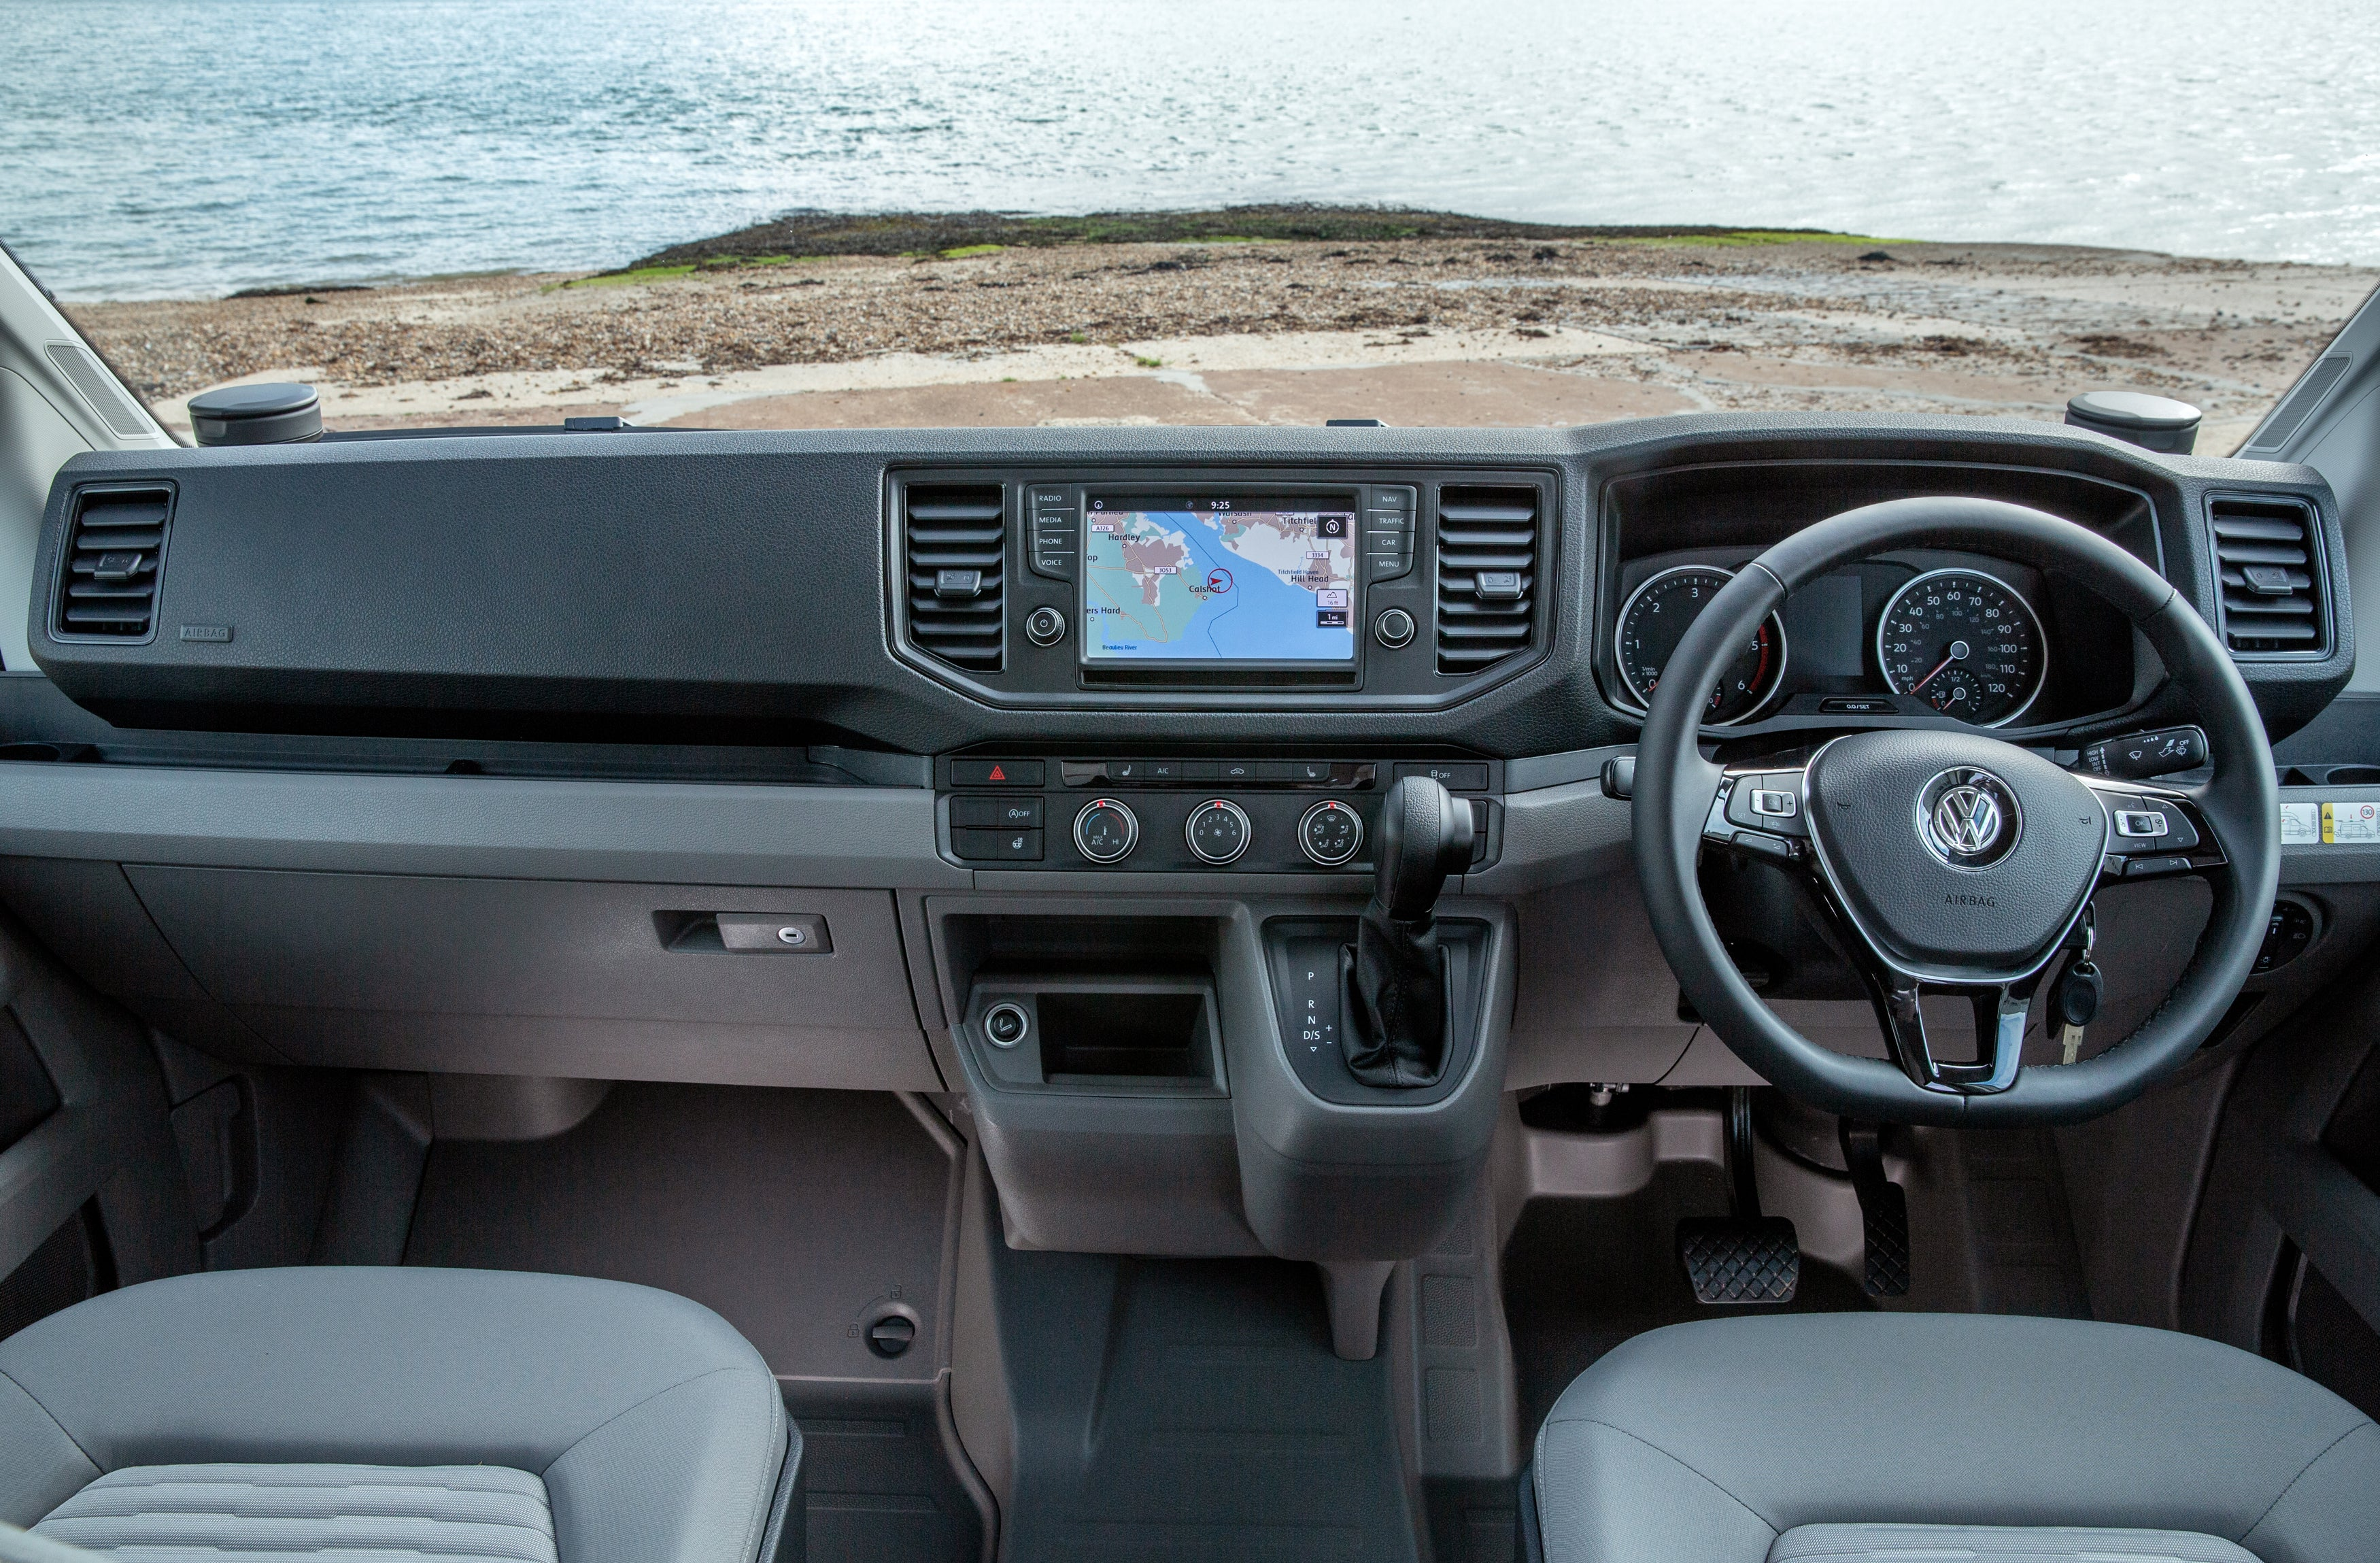 Volkswagen Grand California Front Interior